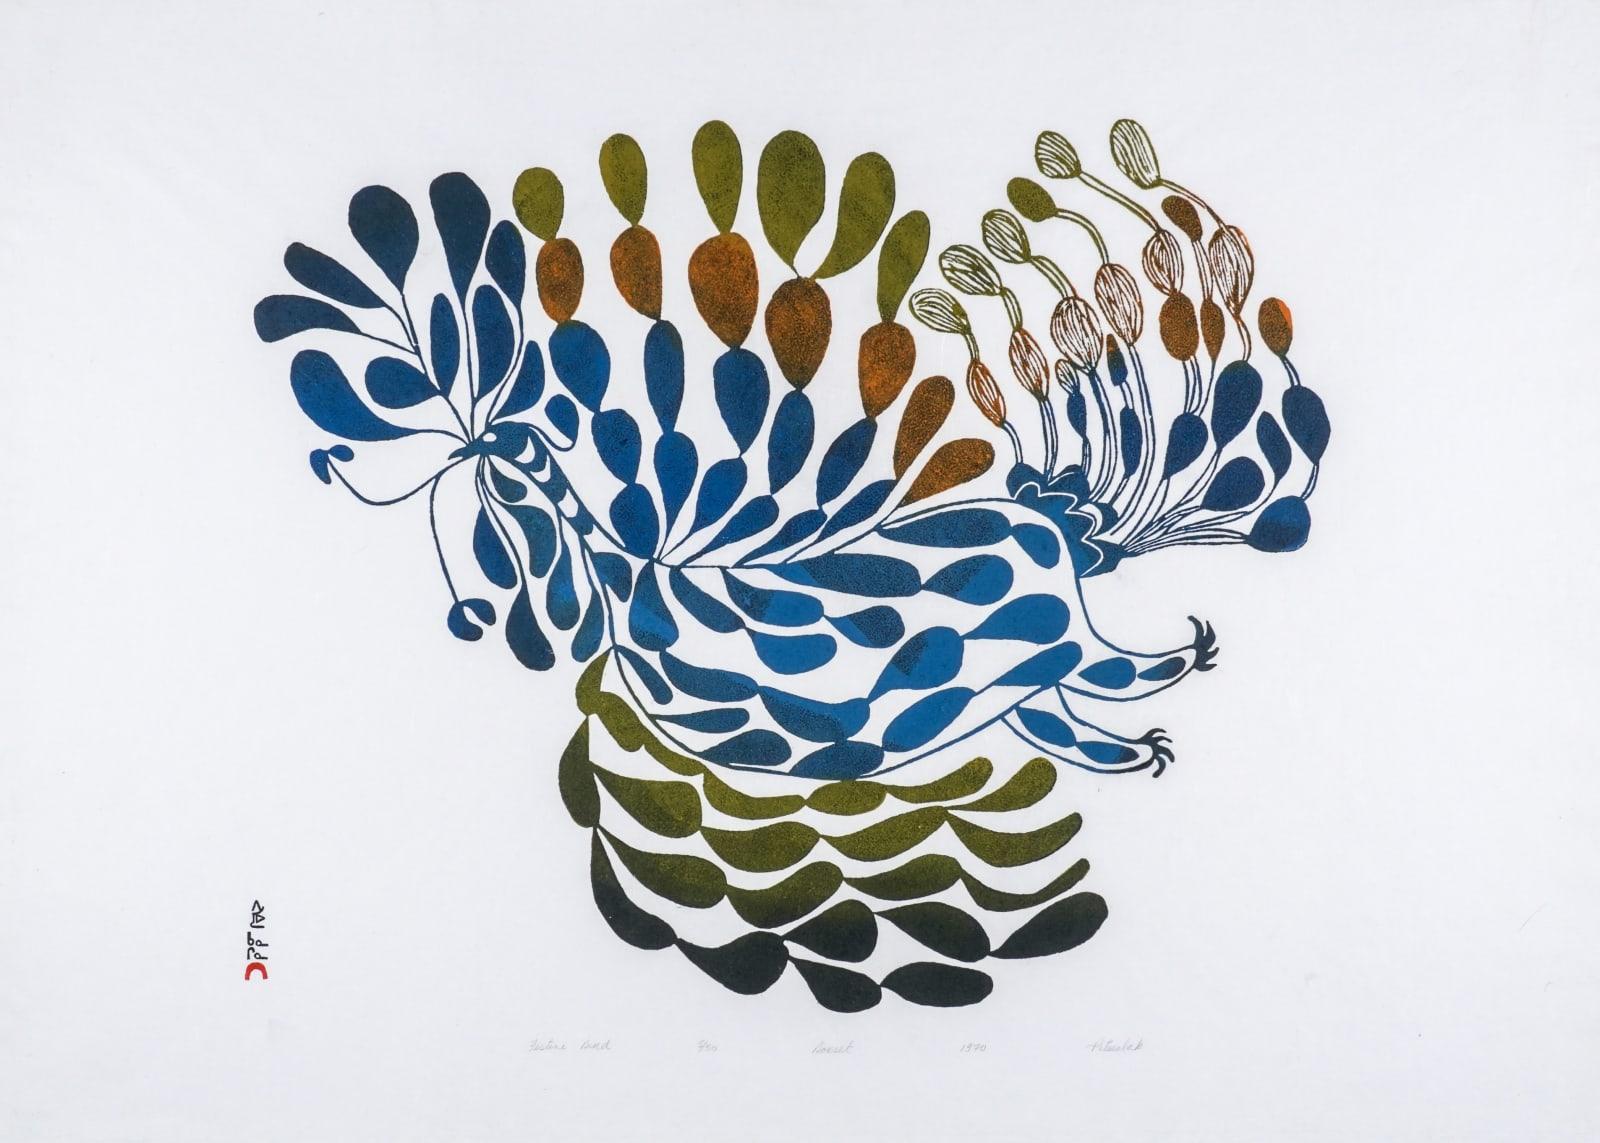 LOT 17 PITSEOLAK ASHOONA, R.C.A., O.C., (1904-1983) KINNGAIT (CAPE DORSET) Festive Bird, 1970 stonecut, 23 1/2 x 33 1/2 in (59.7 x 85.1 cm) ESTIMATE: $1,800 —$2,800